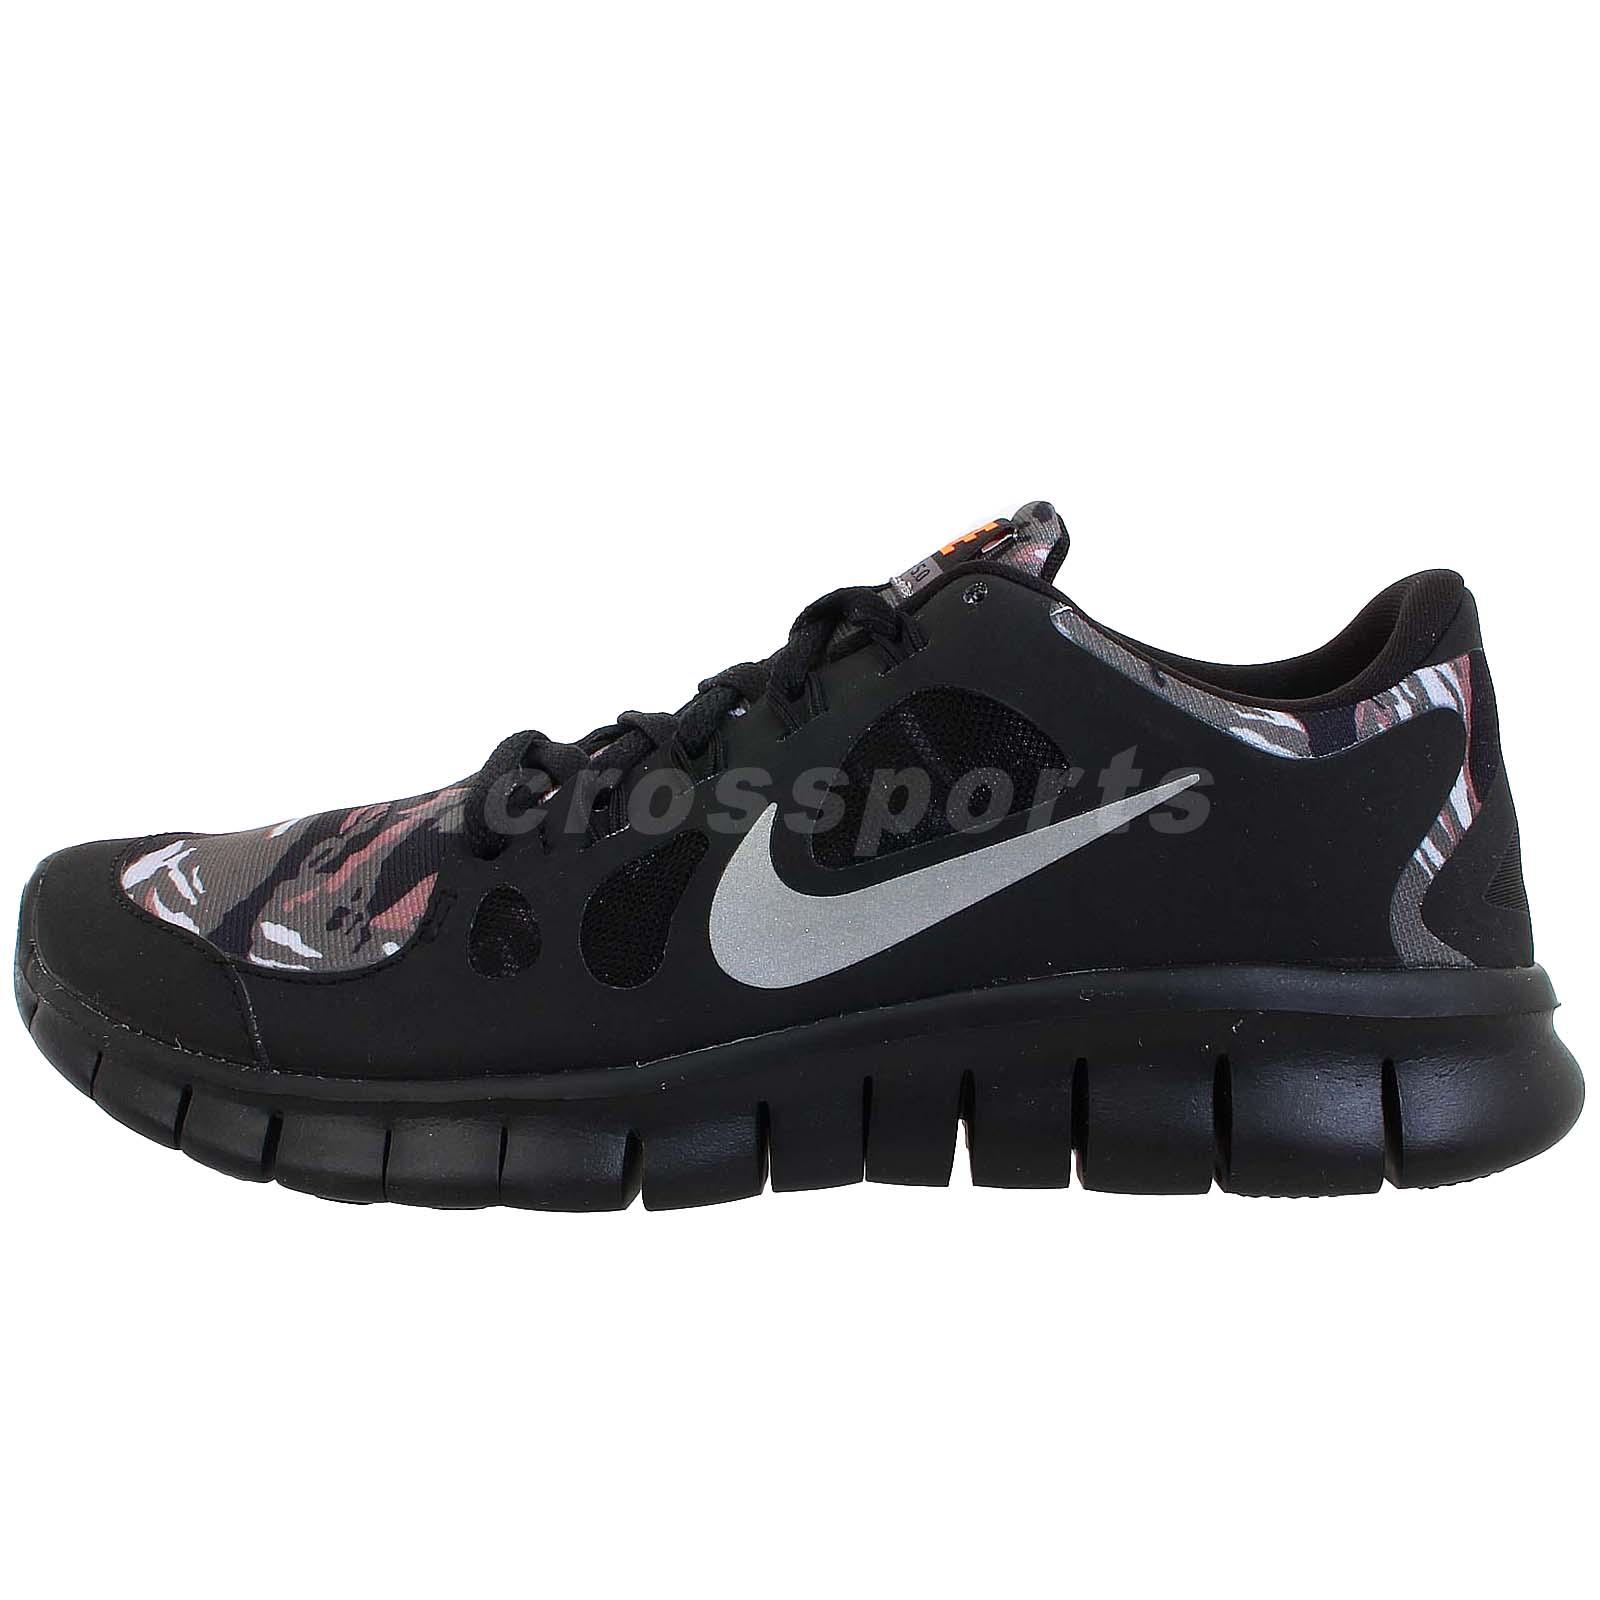 Nike Free 5 0 GS Black Silver Camo Girls Boys Youth Womens Running